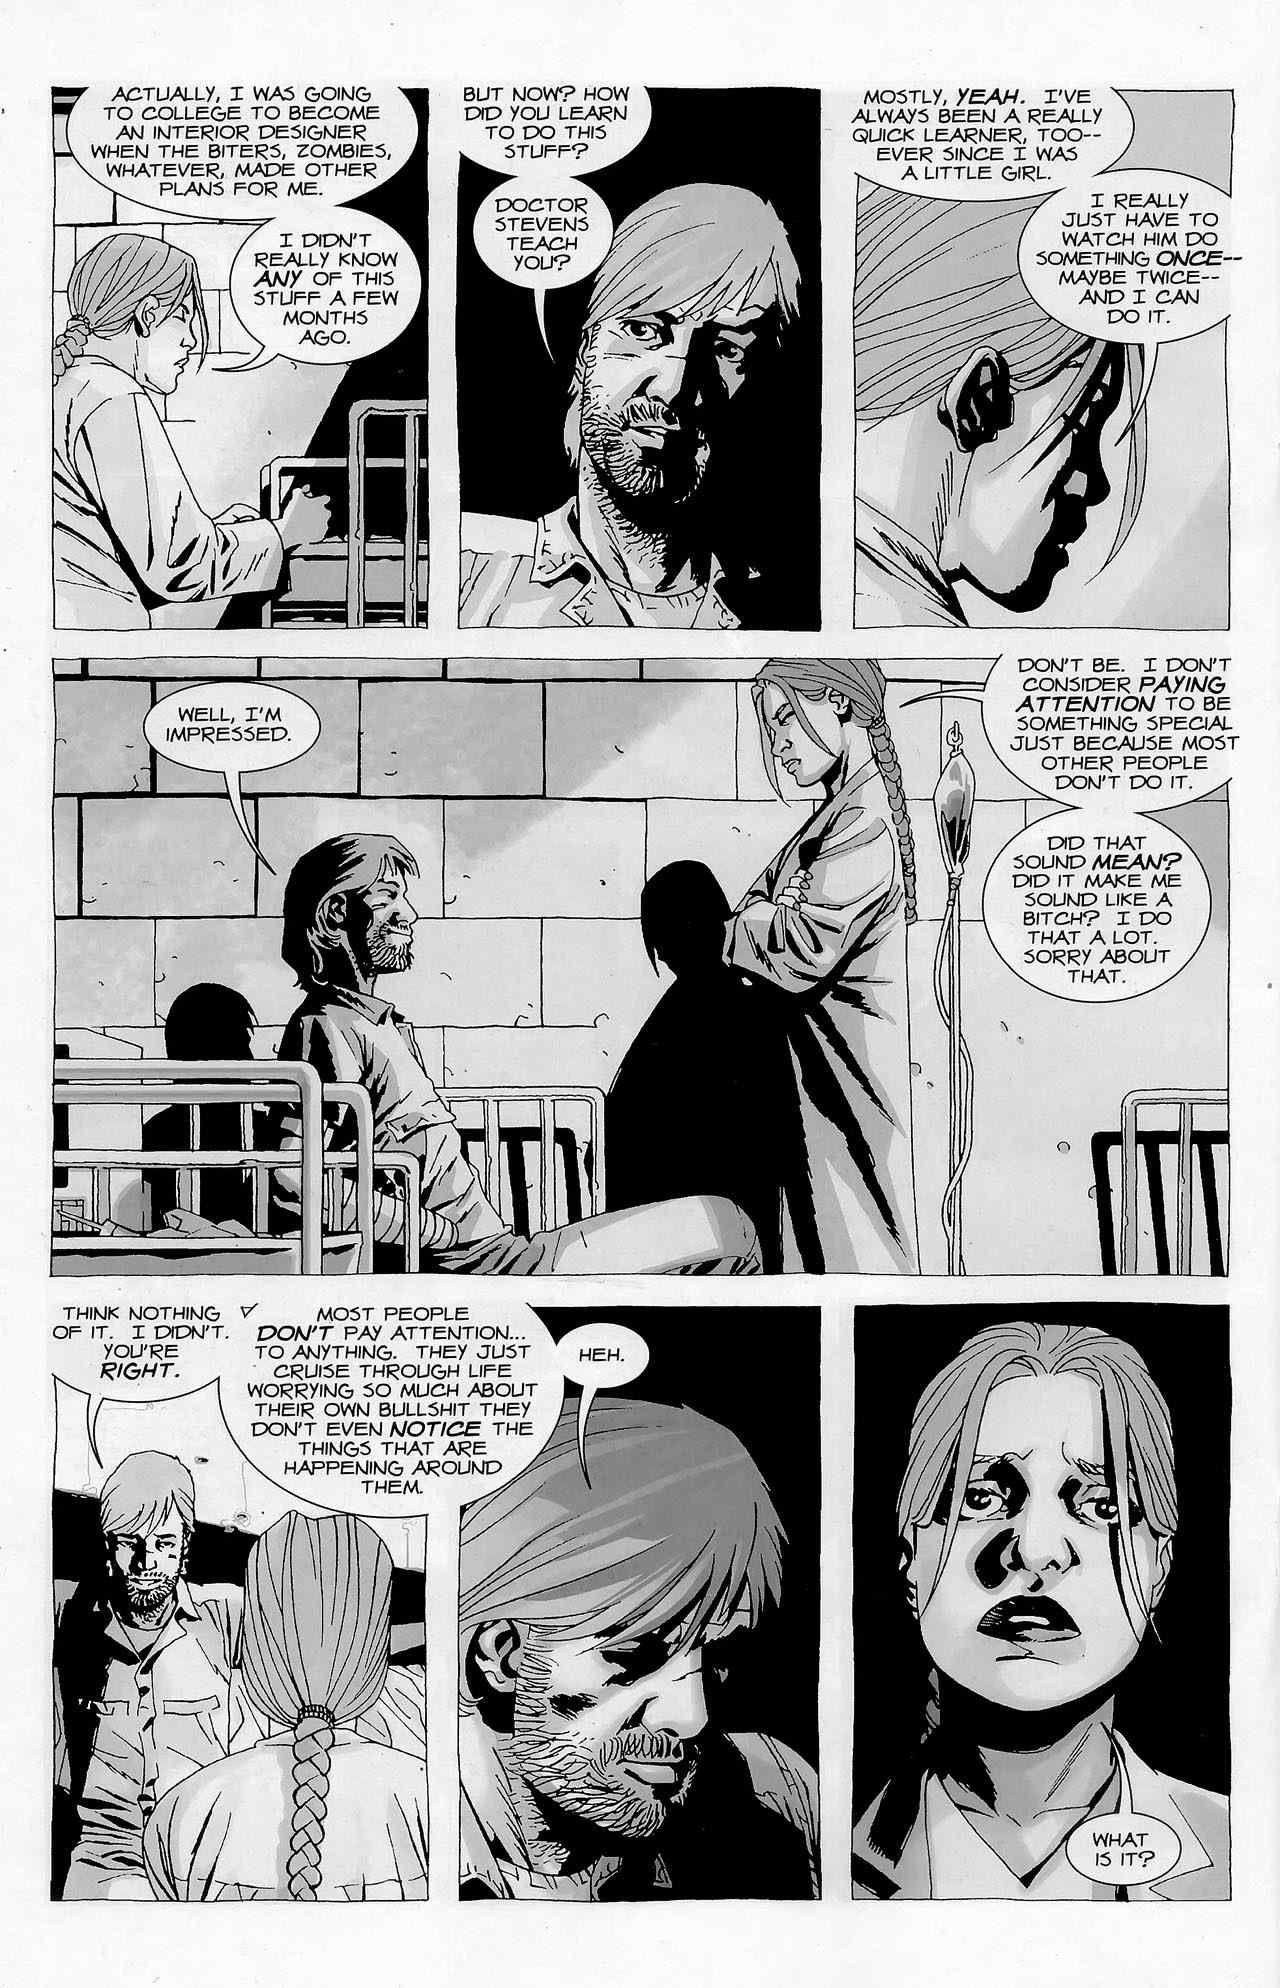 Read Comics Online Free - The Walking Dead - Chapter 031